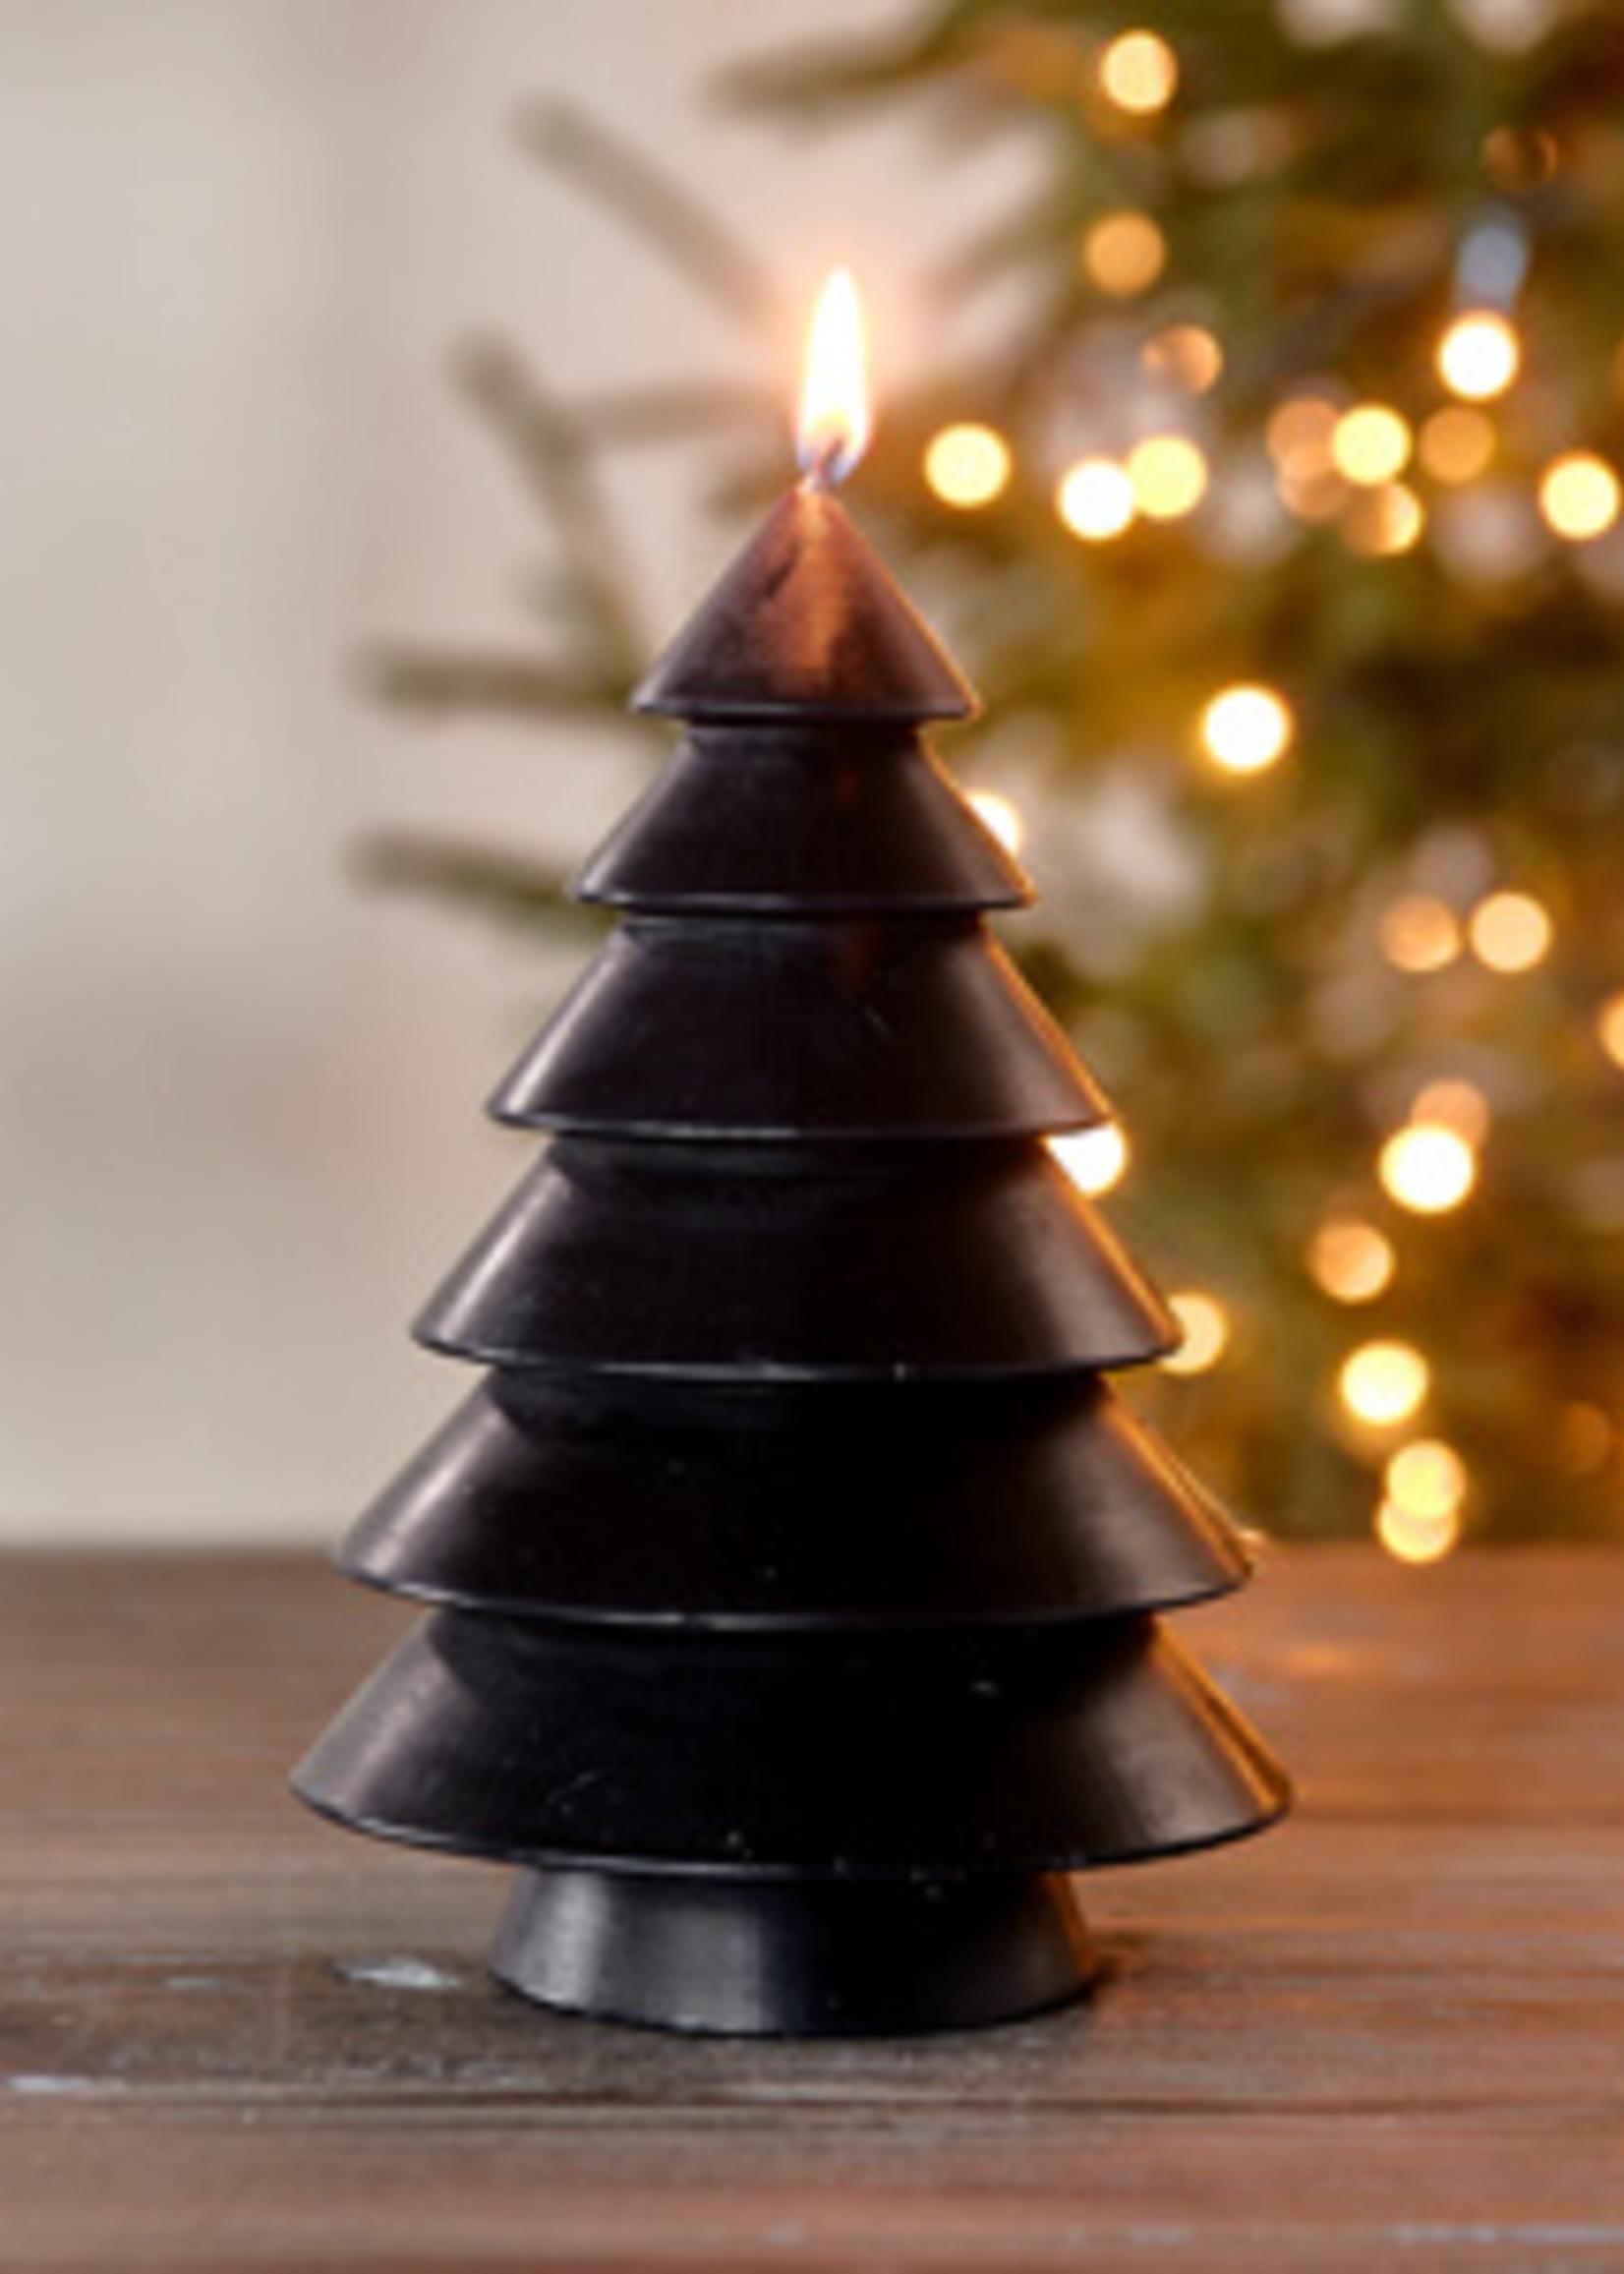 Riviera Maison Wonderful Christmas Candle black